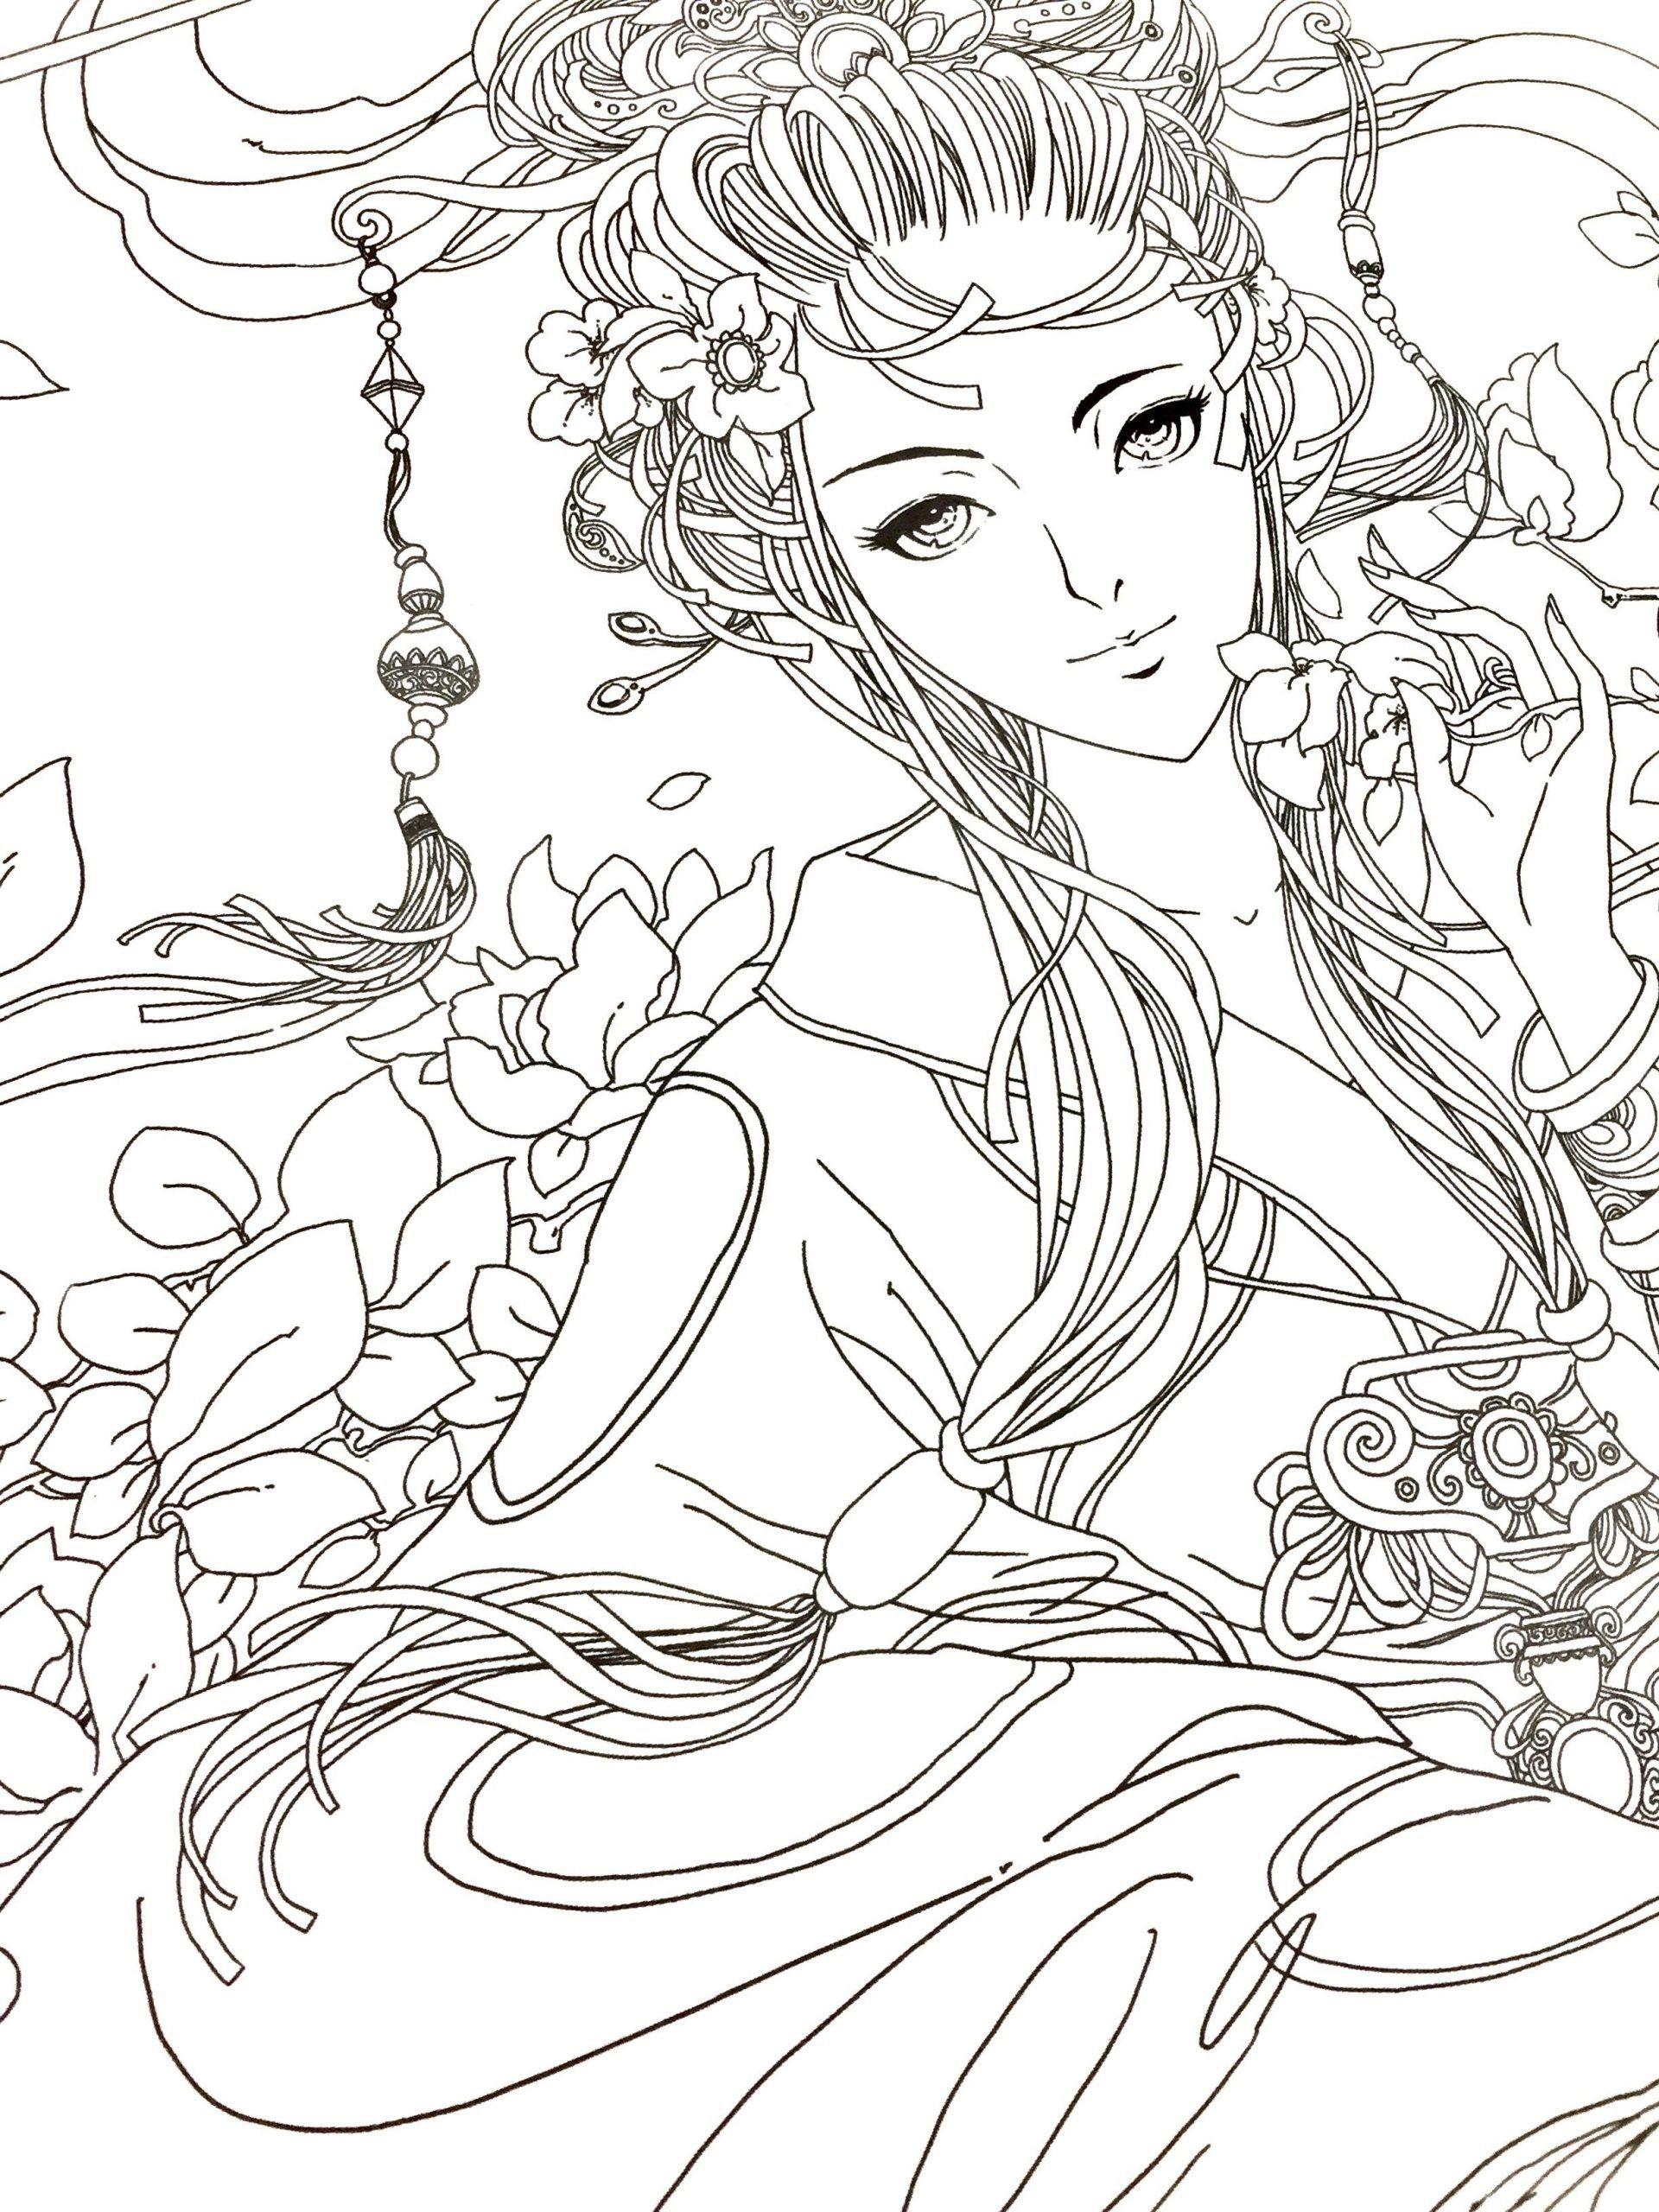 Tremendous Anime Coloring Book Online Pages Girl Free To Print Trong 2021 Y Tưởng Hinh Xăm Phac Thảo Hinh Xăm Hinh Xăm [ 2560 x 1920 Pixel ]